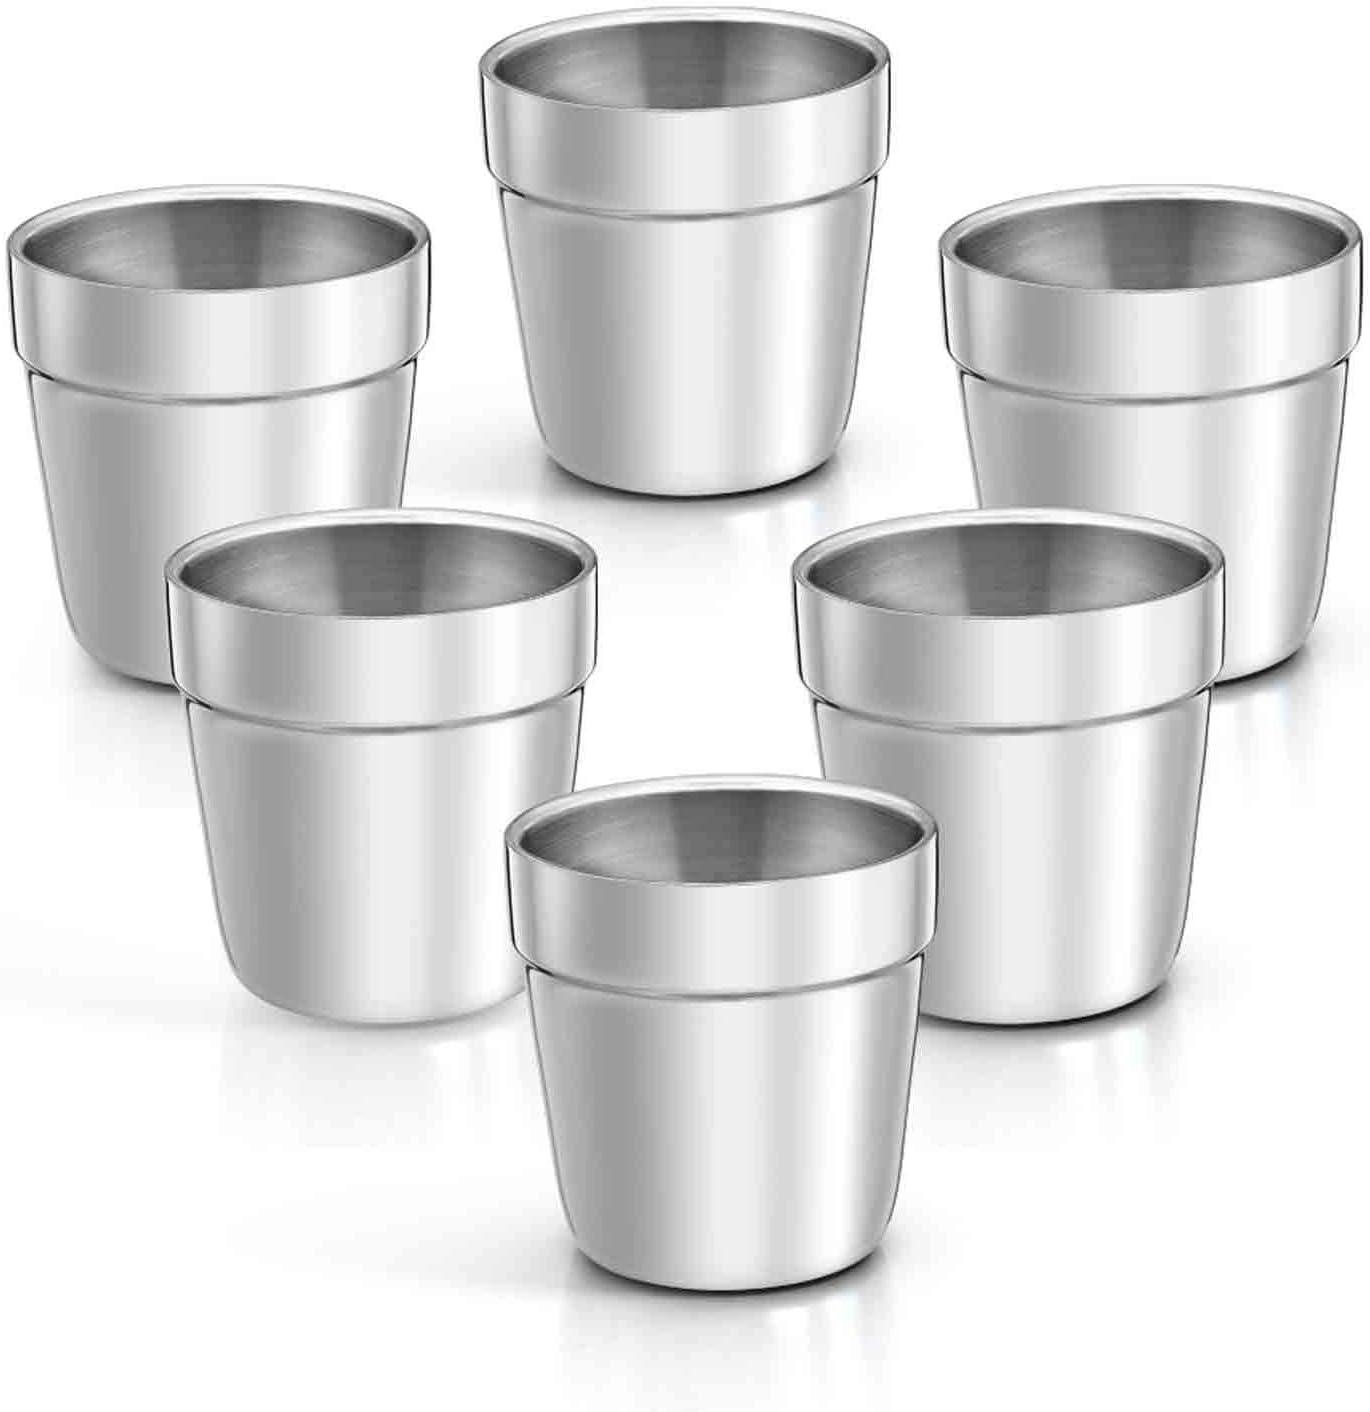 TeamFar Toddler Cups Limited price 6 Ranking TOP12 oz Insulated Tumbler St Mug